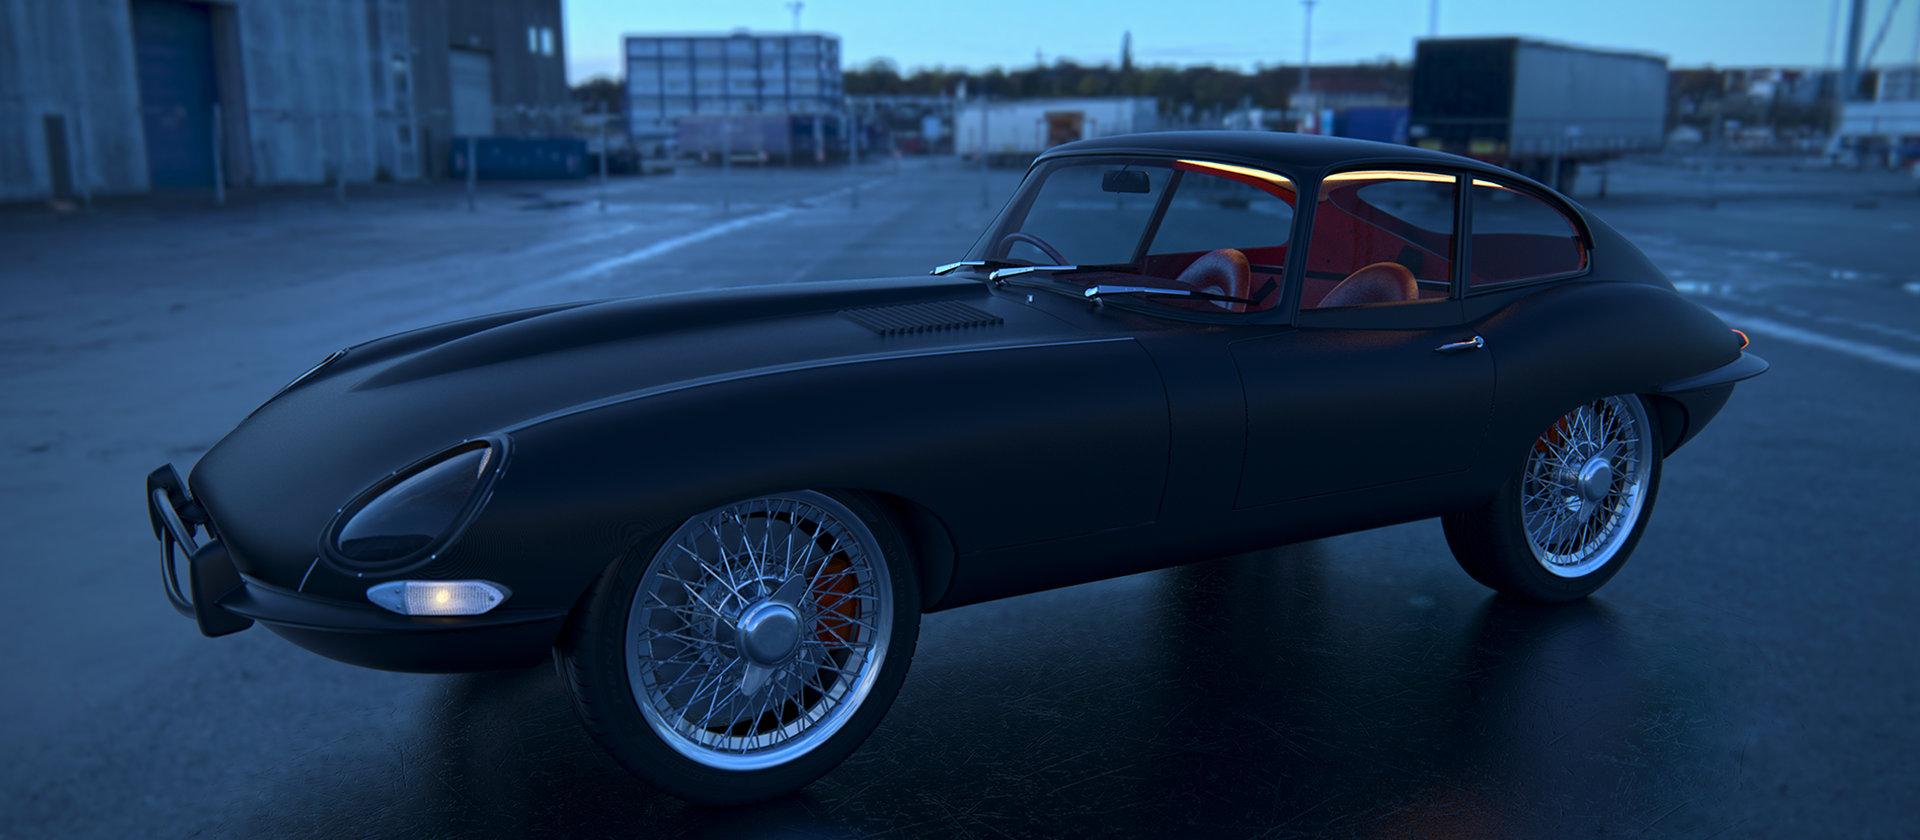 Michael marcondes blkup04 jaguar 1961 e type s1 3